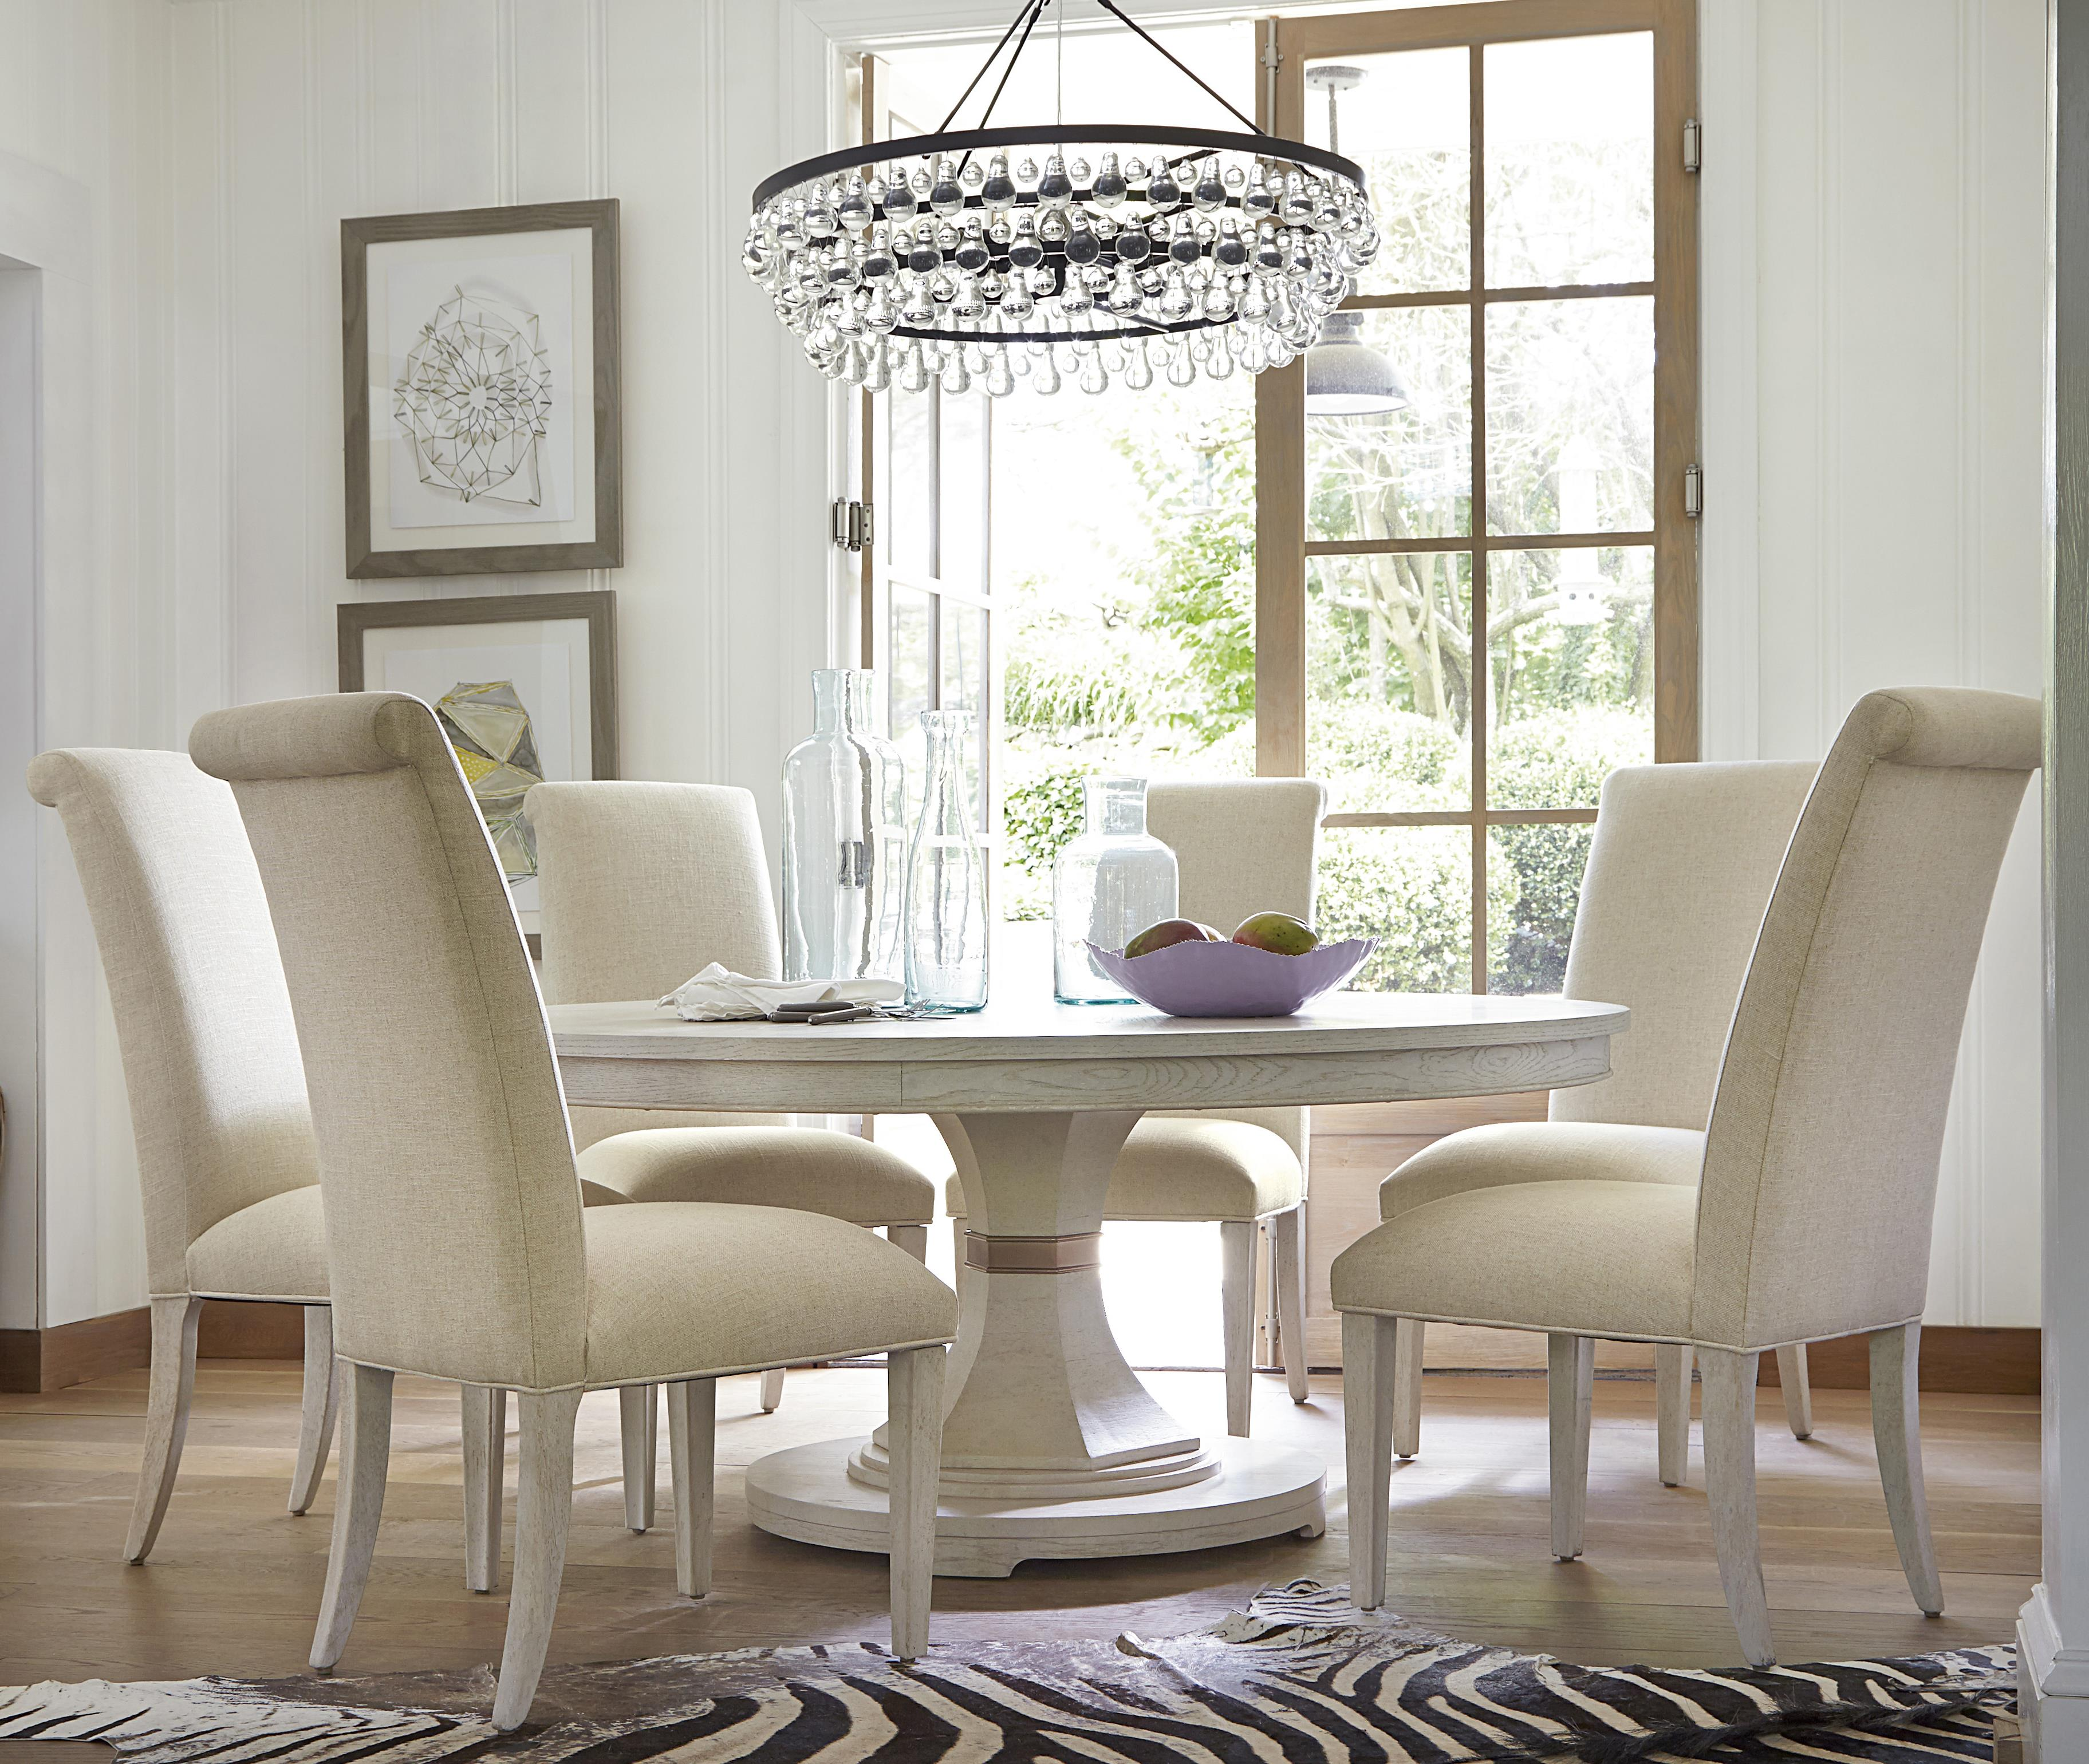 Universal California - Malibu 7 Piece Dining Set - Item Number: 476657+638-RTA